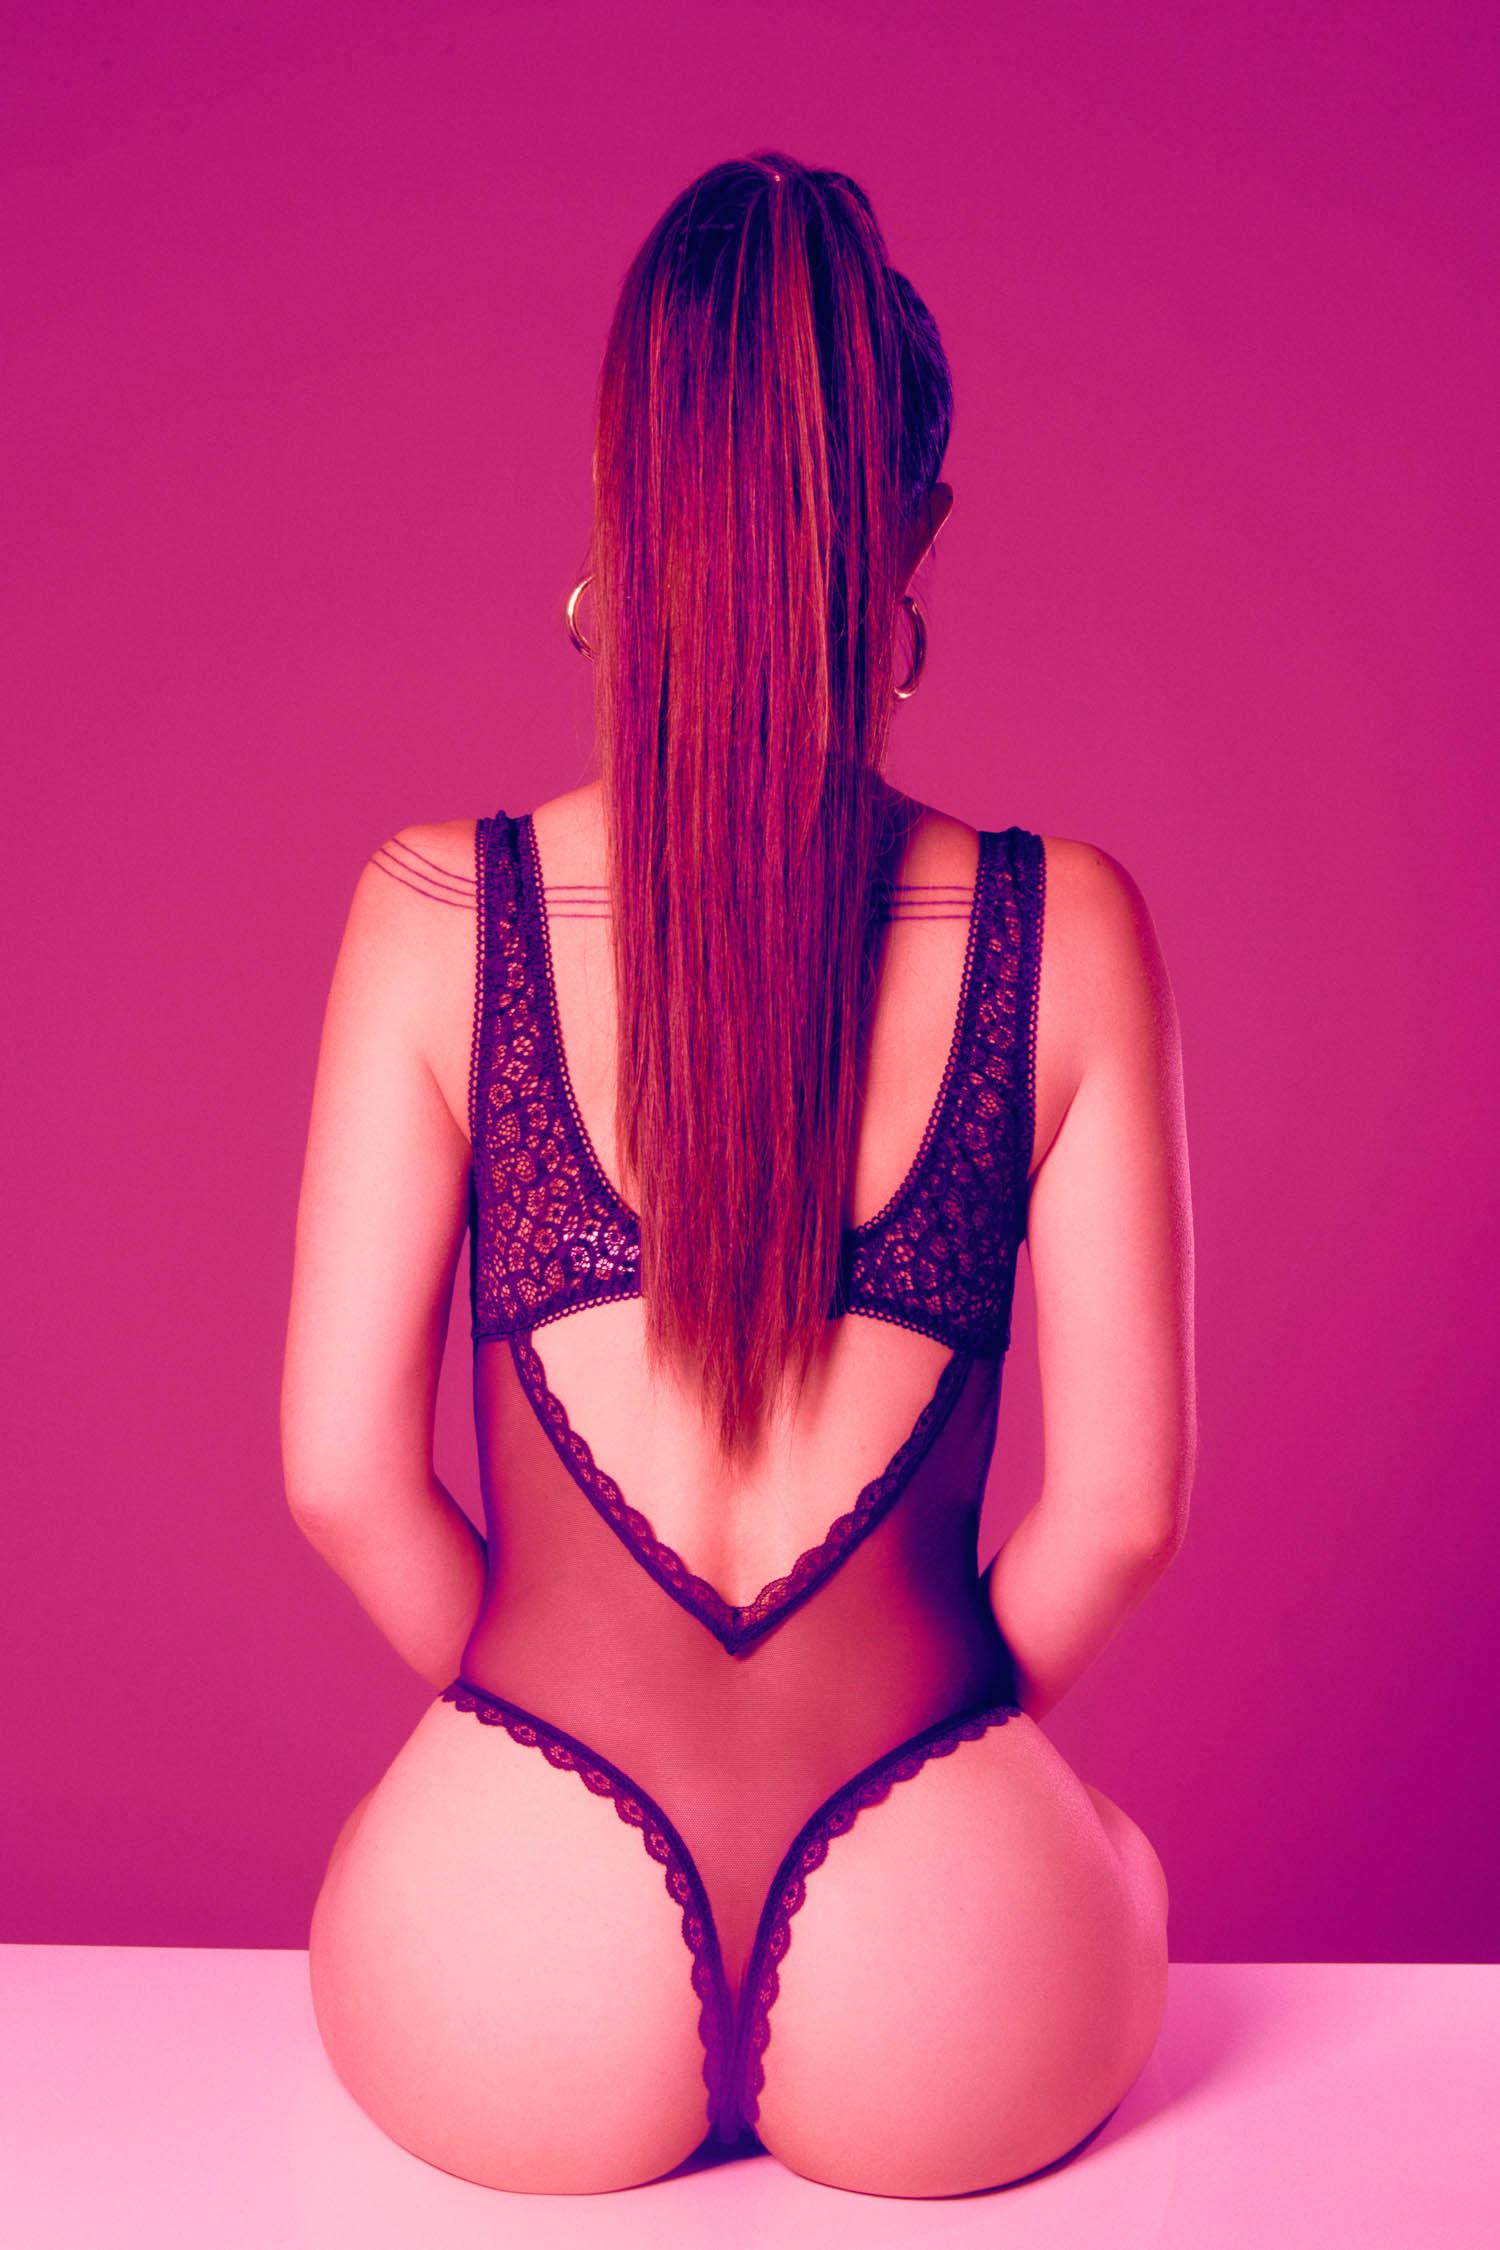 Ariana Grande themed boudoir photography